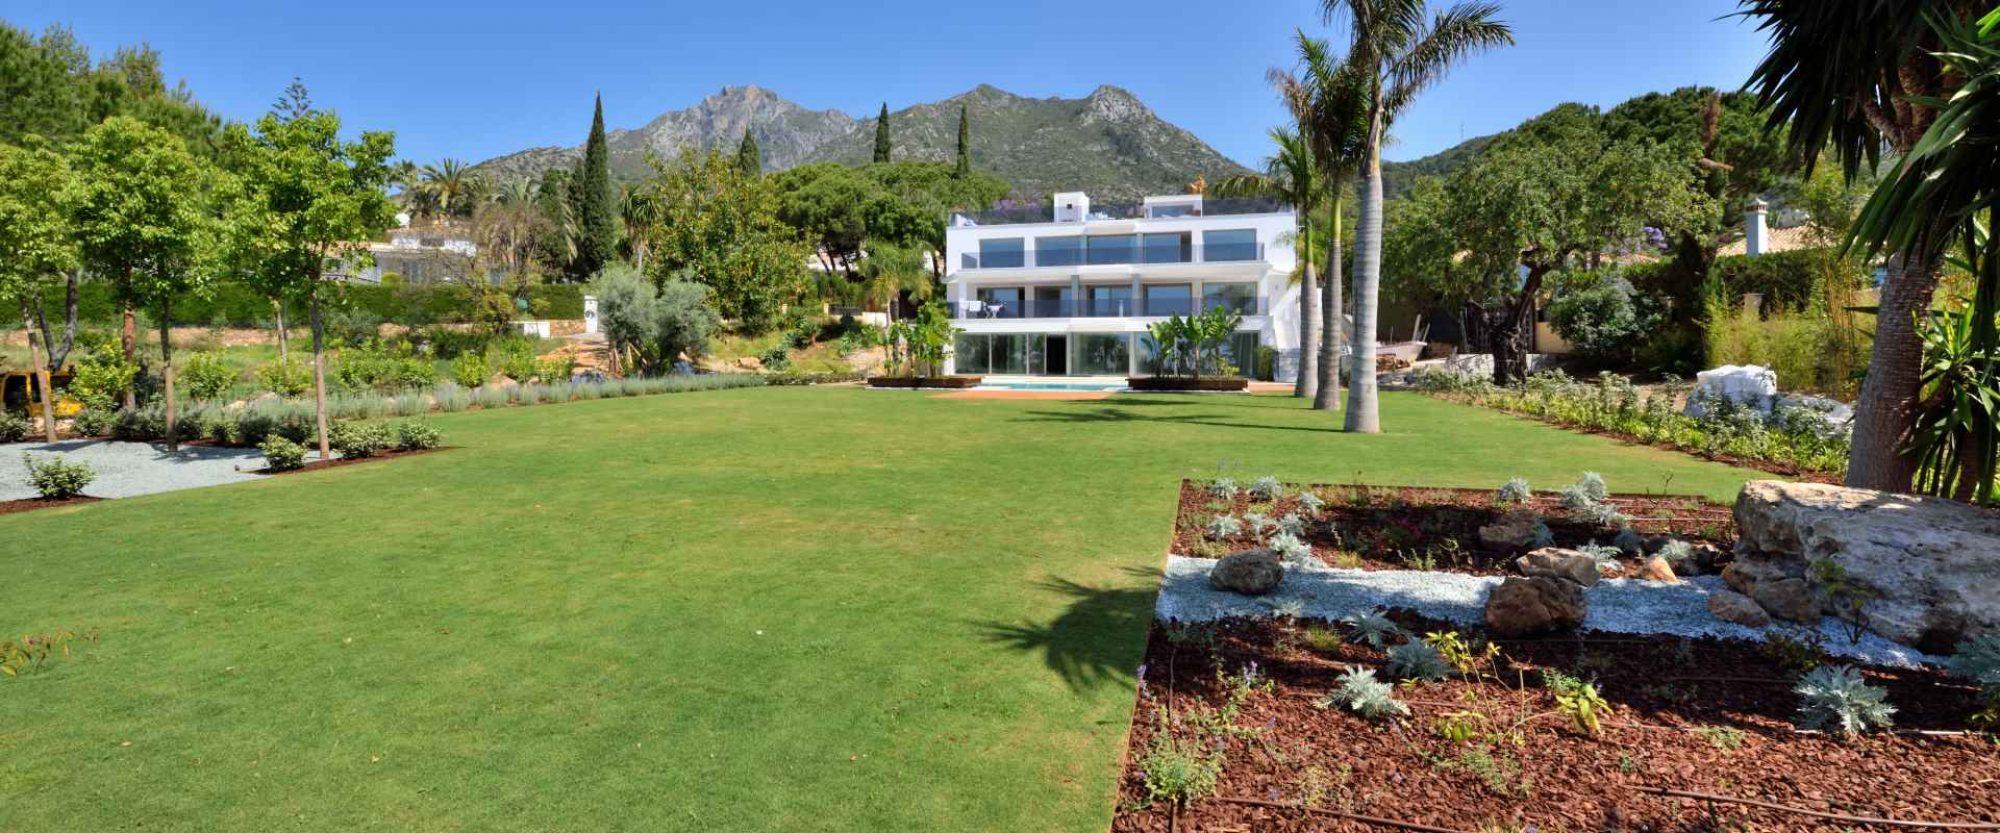 Cascada de Camojan Villa for sale with 5300m2 plot